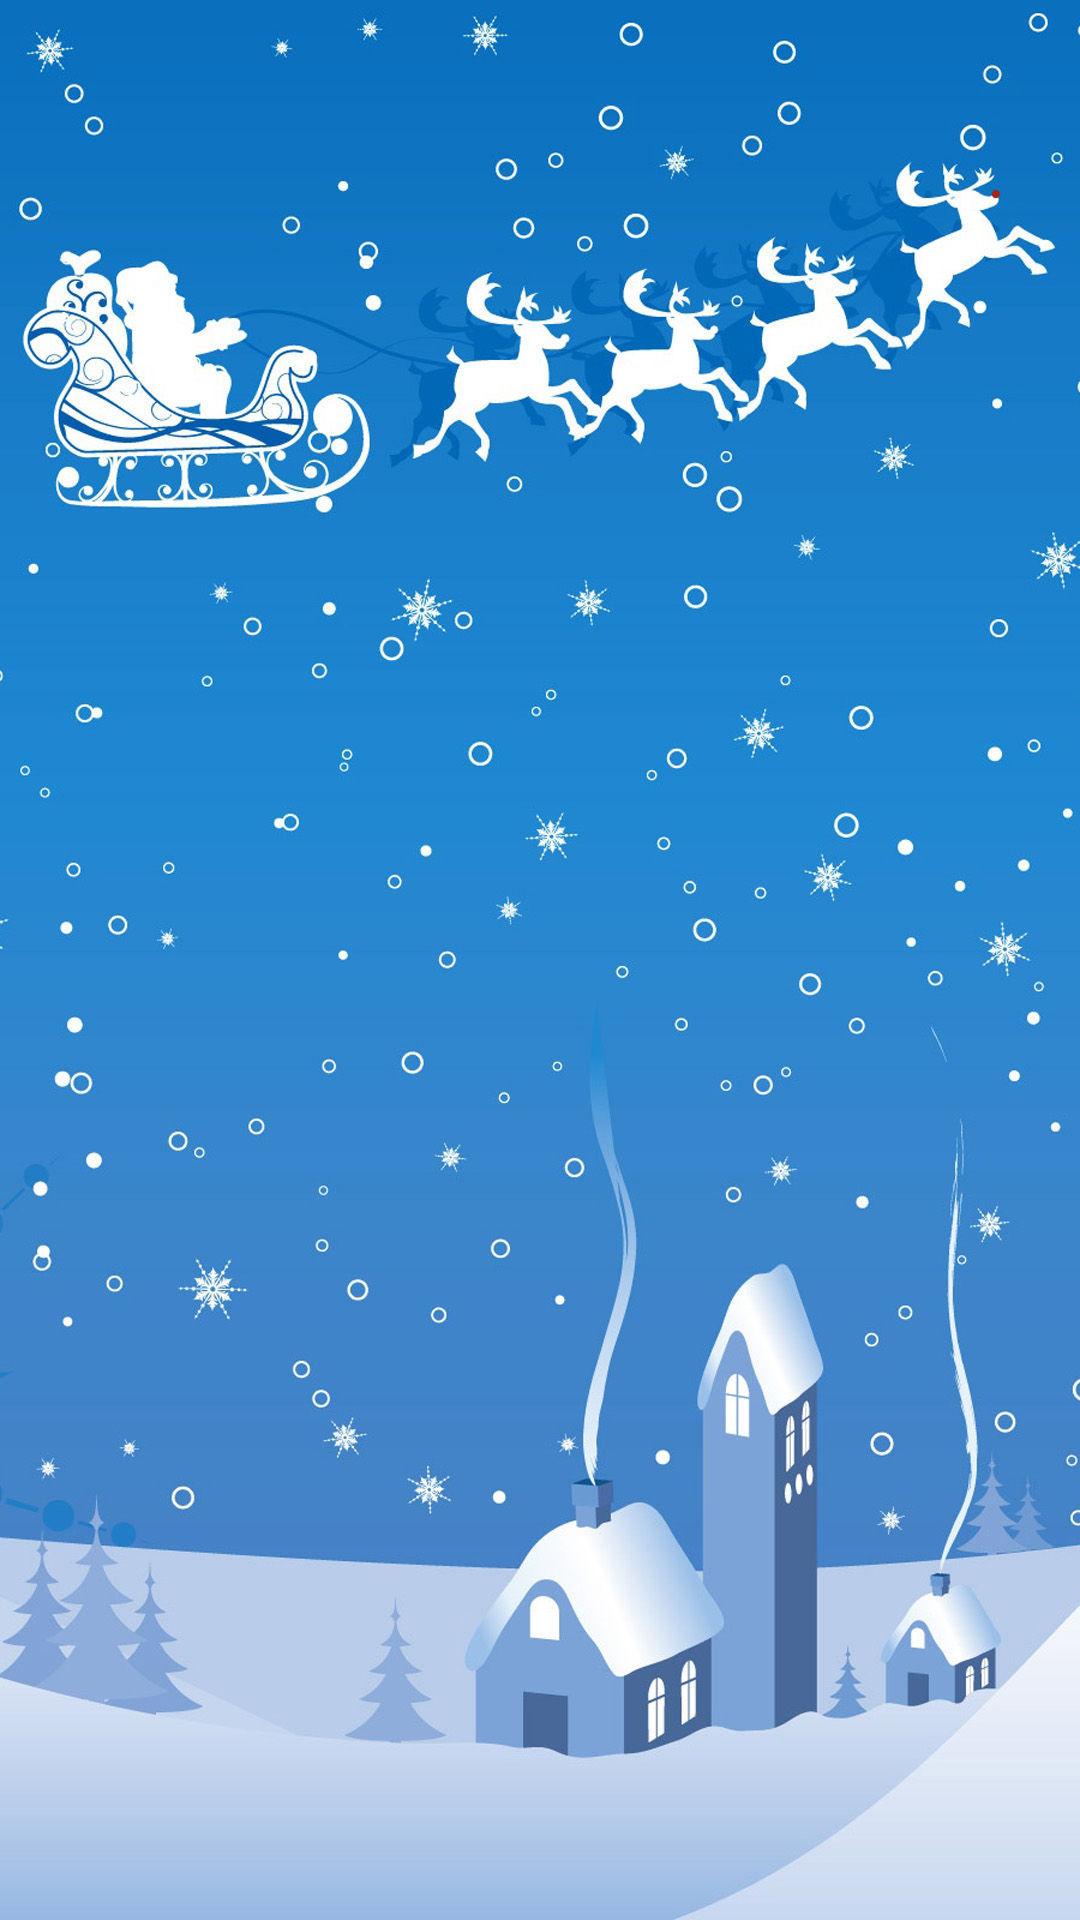 Christmas theme blue background HD samsung galaxy s4 wallpaper 1080x1920